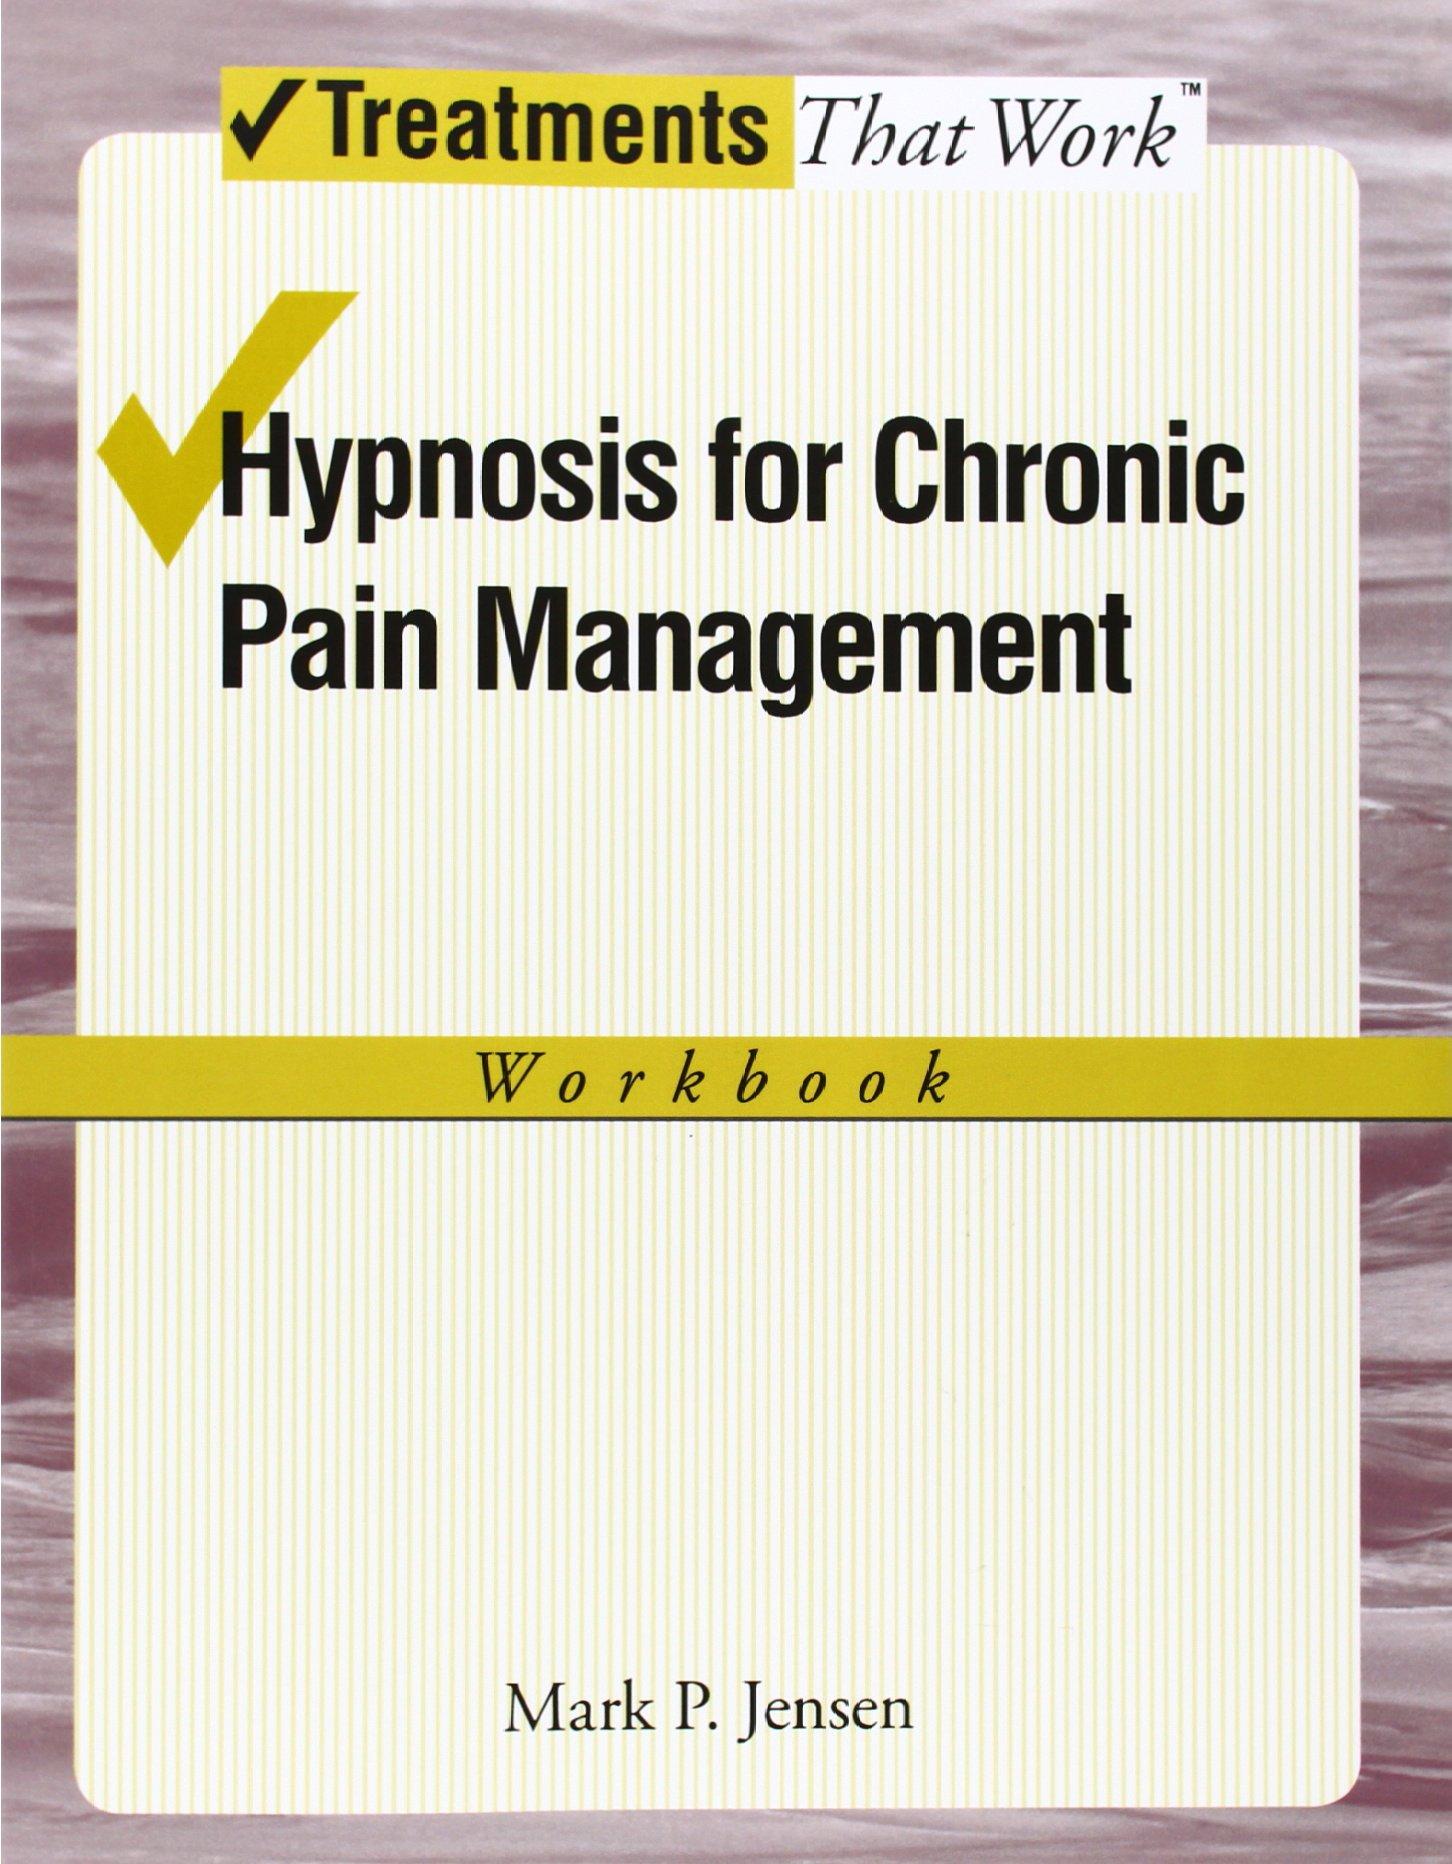 Hypnosis for Chronic Pain Management: Workbook (Treatments That Work): Mark  P. Jensen: 9780199772384: Amazon.com: Books